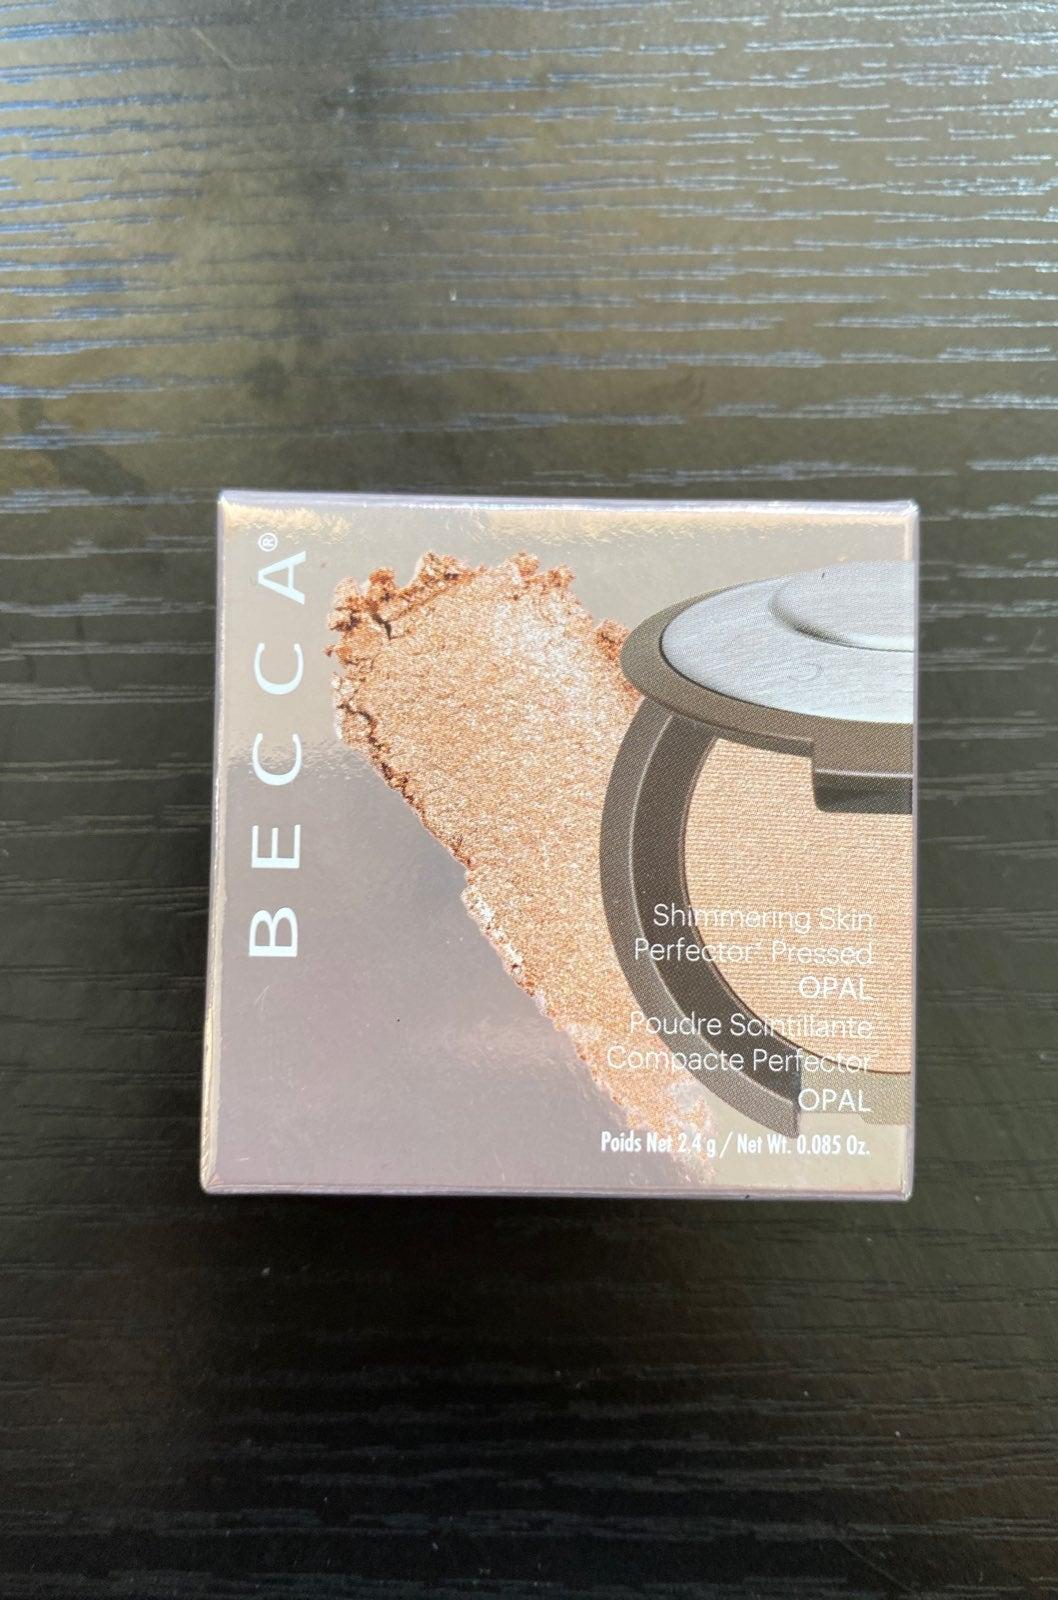 becca shimmering skin